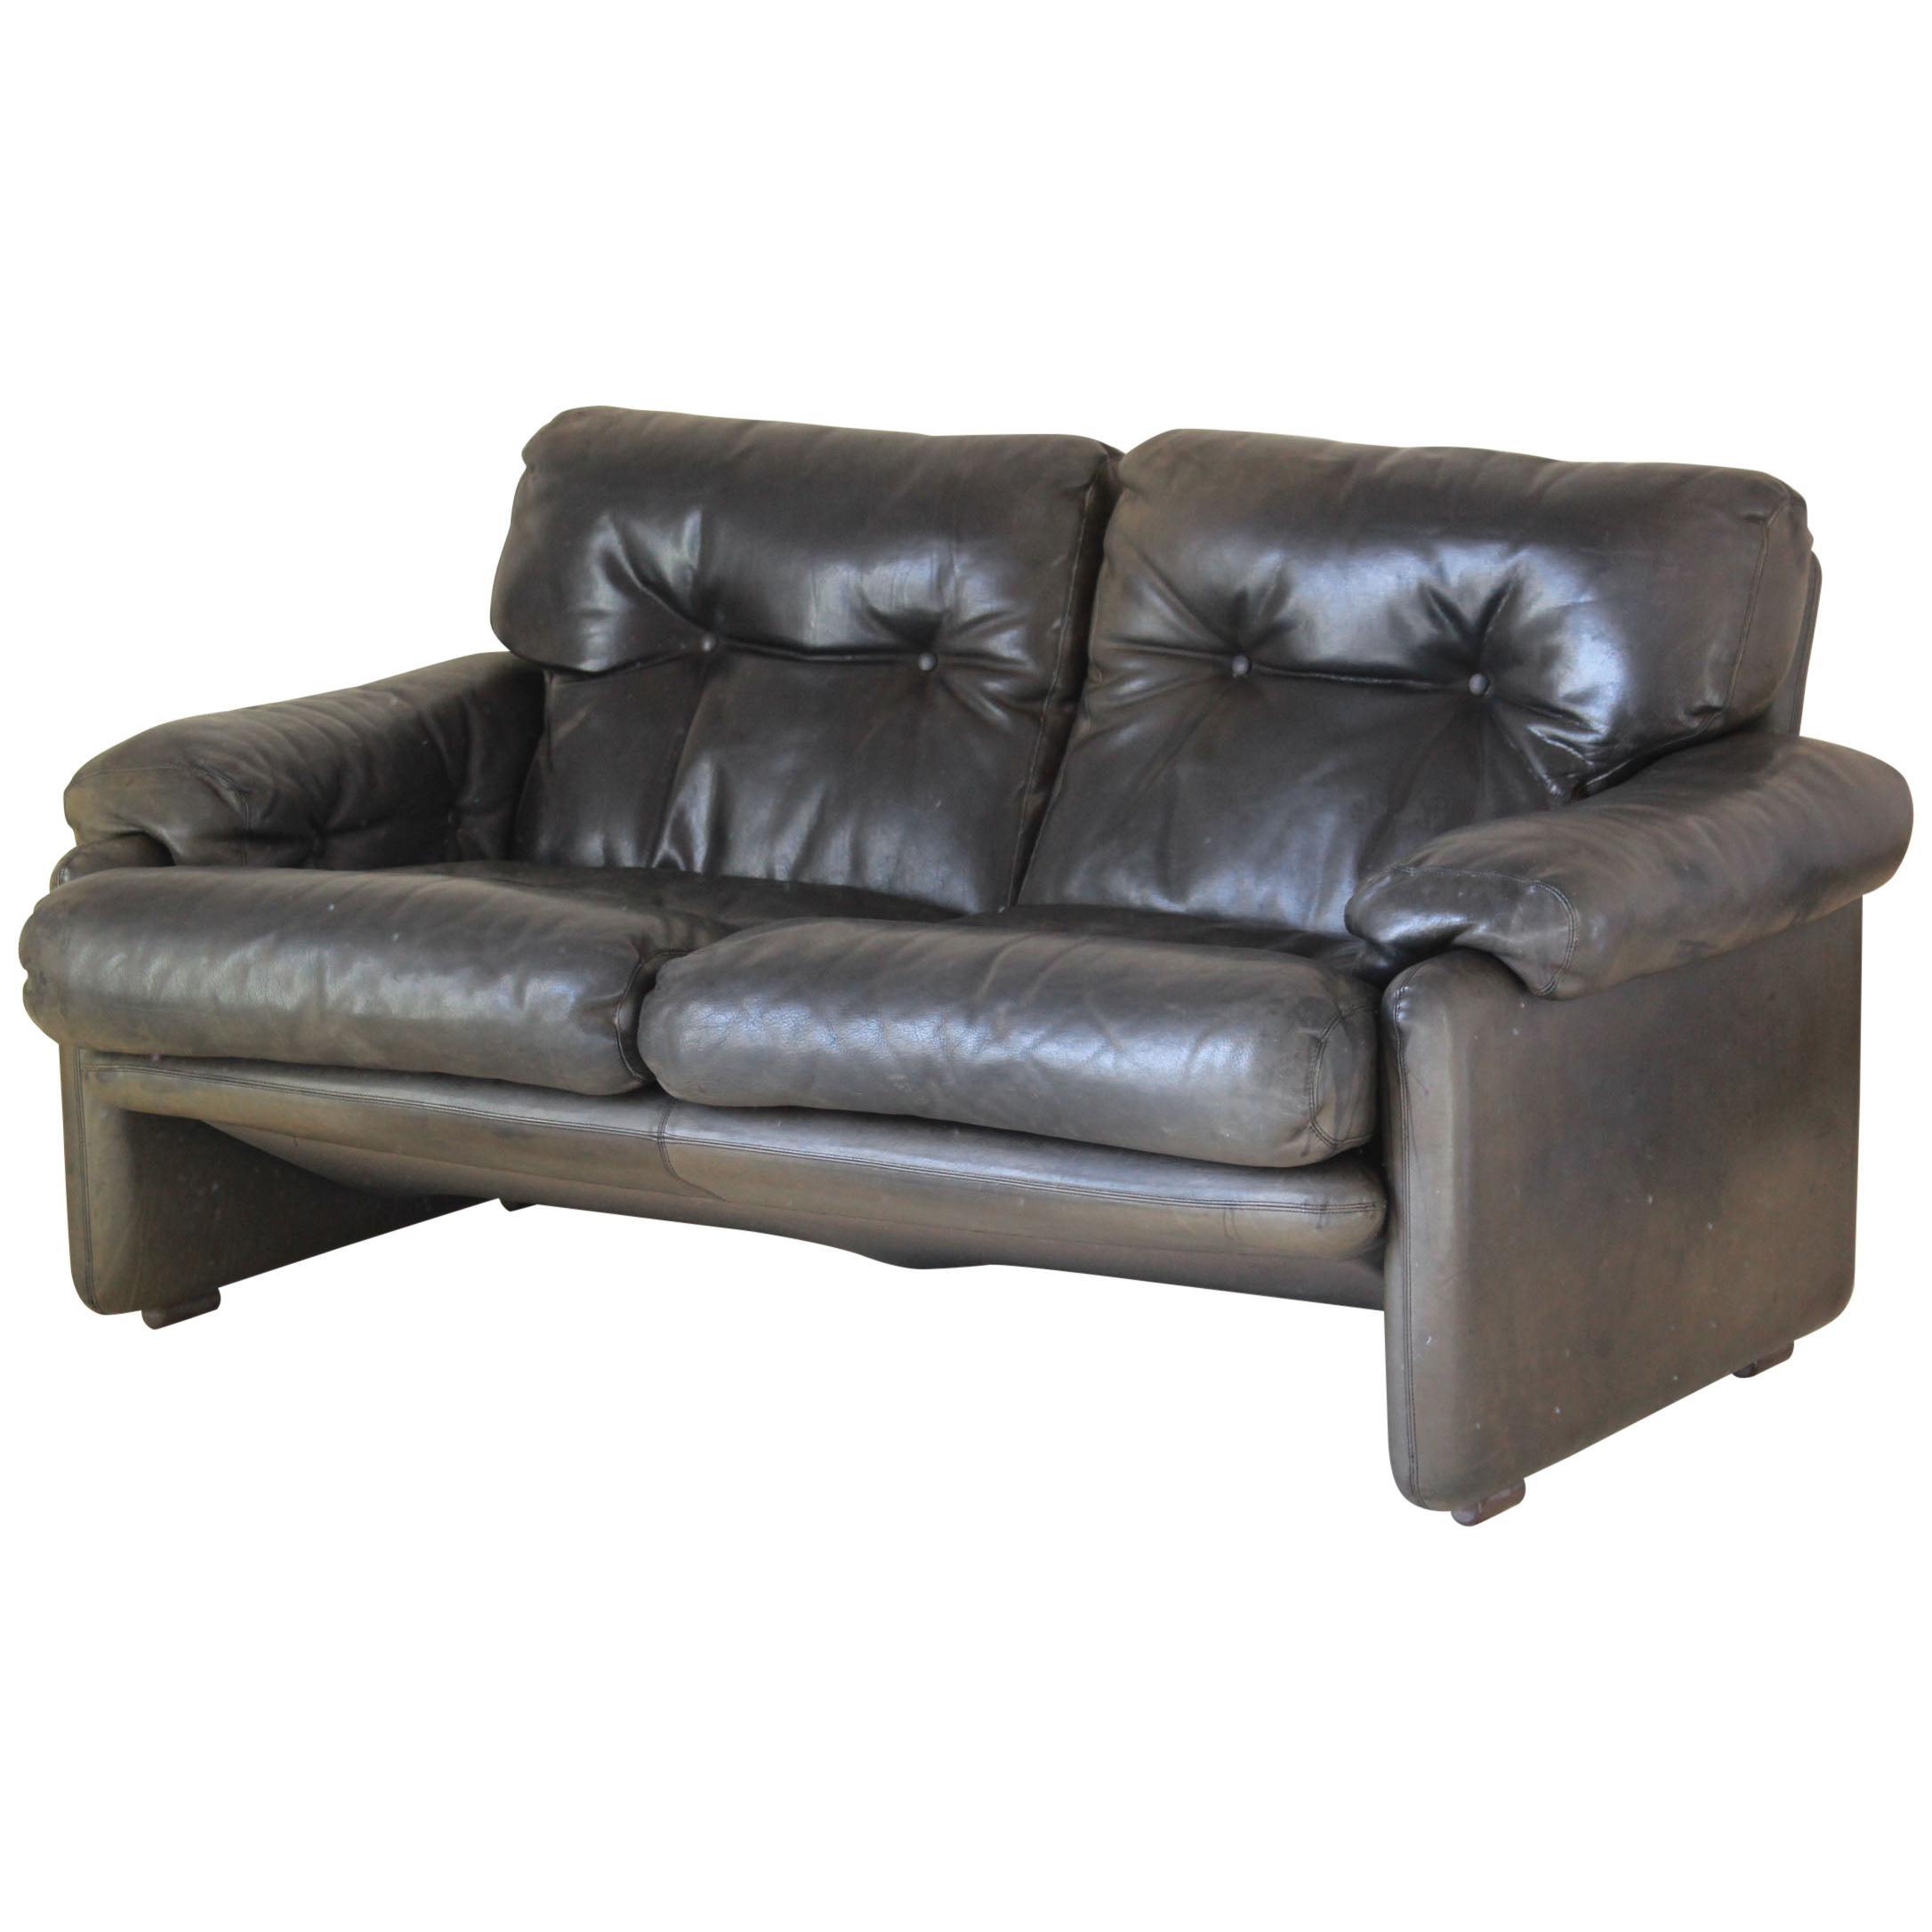 Vintage leather Sofa by B&B Italia by Afra & Tobia Scarpa designers